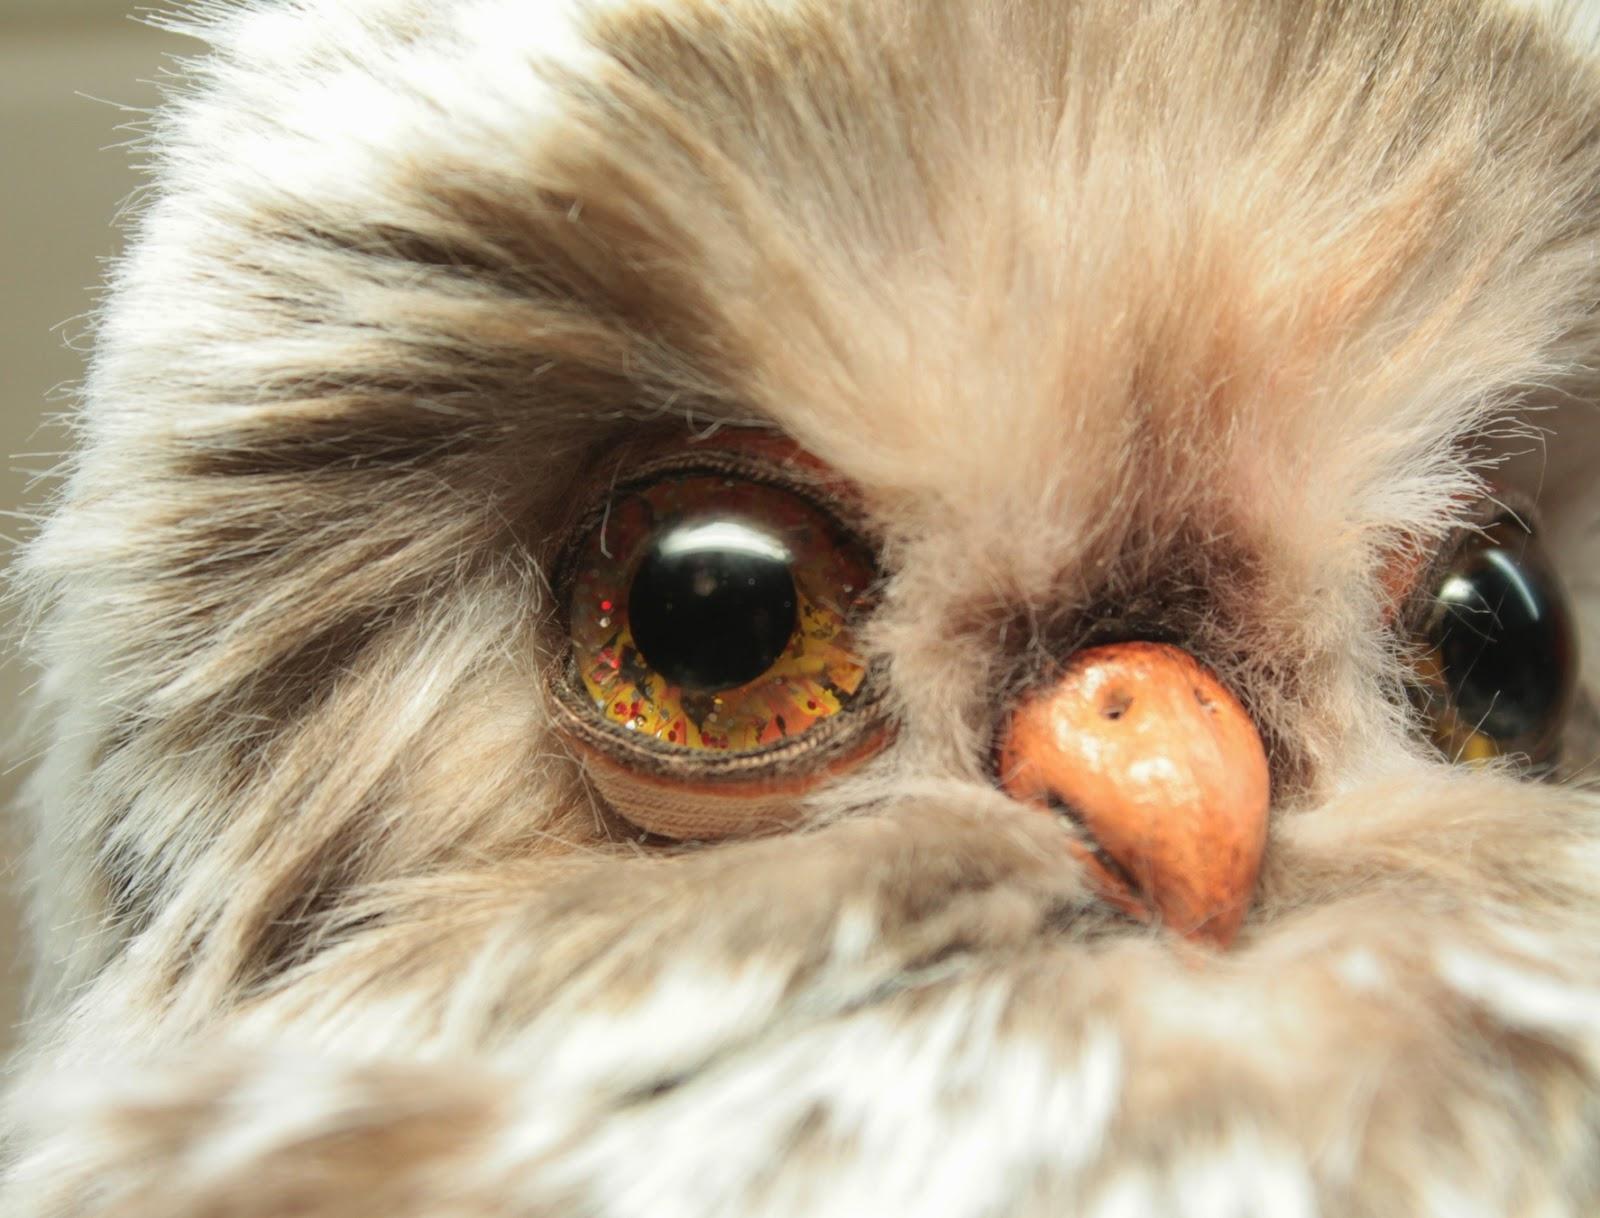 Совенок, курсы по мишкам Тедди, Новосибирск, мастер-классы, мишки Тедди, авторские игрушки, сова